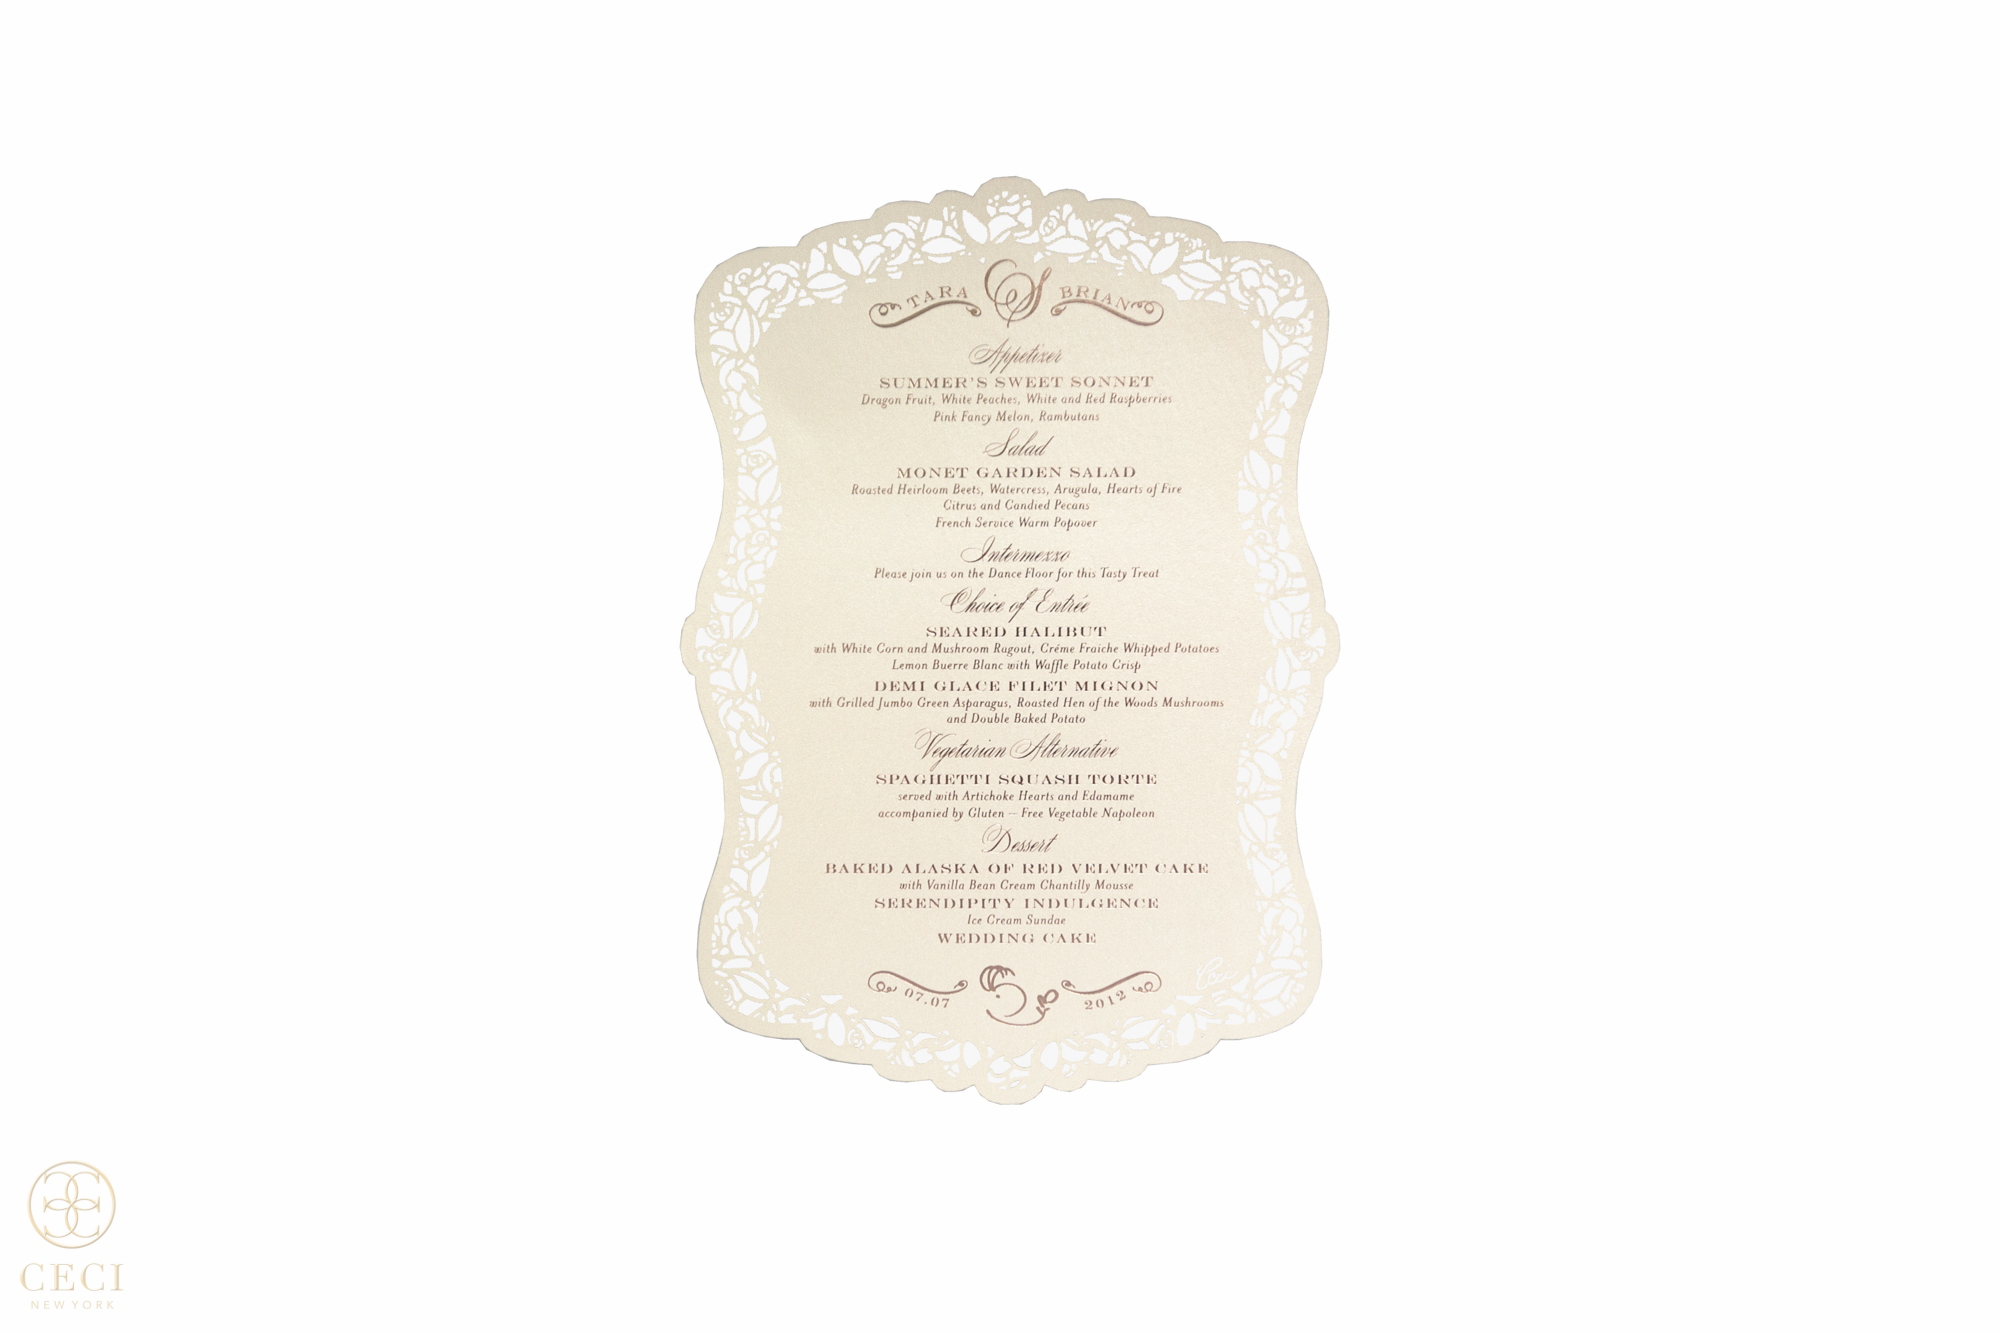 rose_gold_wedding_couture_luxury_invitation_design_lasercut_foil_box_program_ribbon_menu_ketubah_-6.jpg